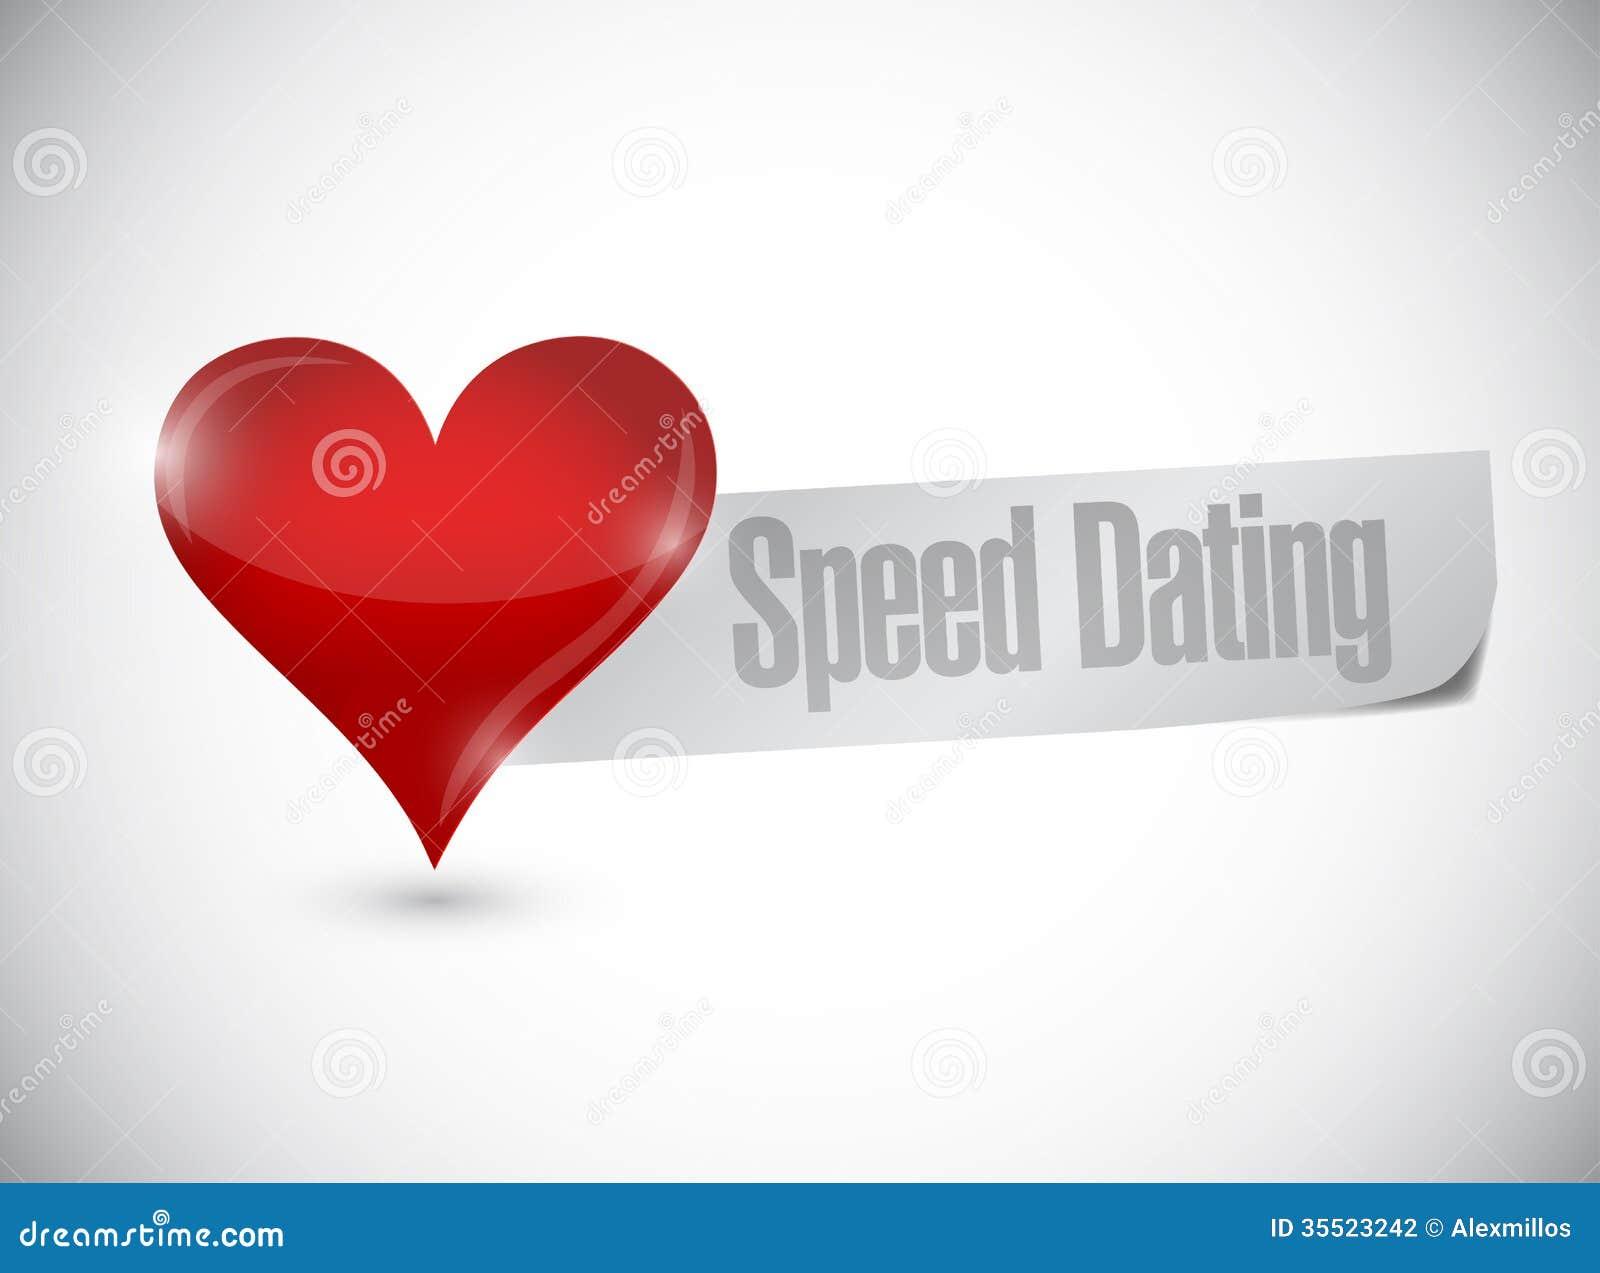 Speed dating Mallorca anm mulatas